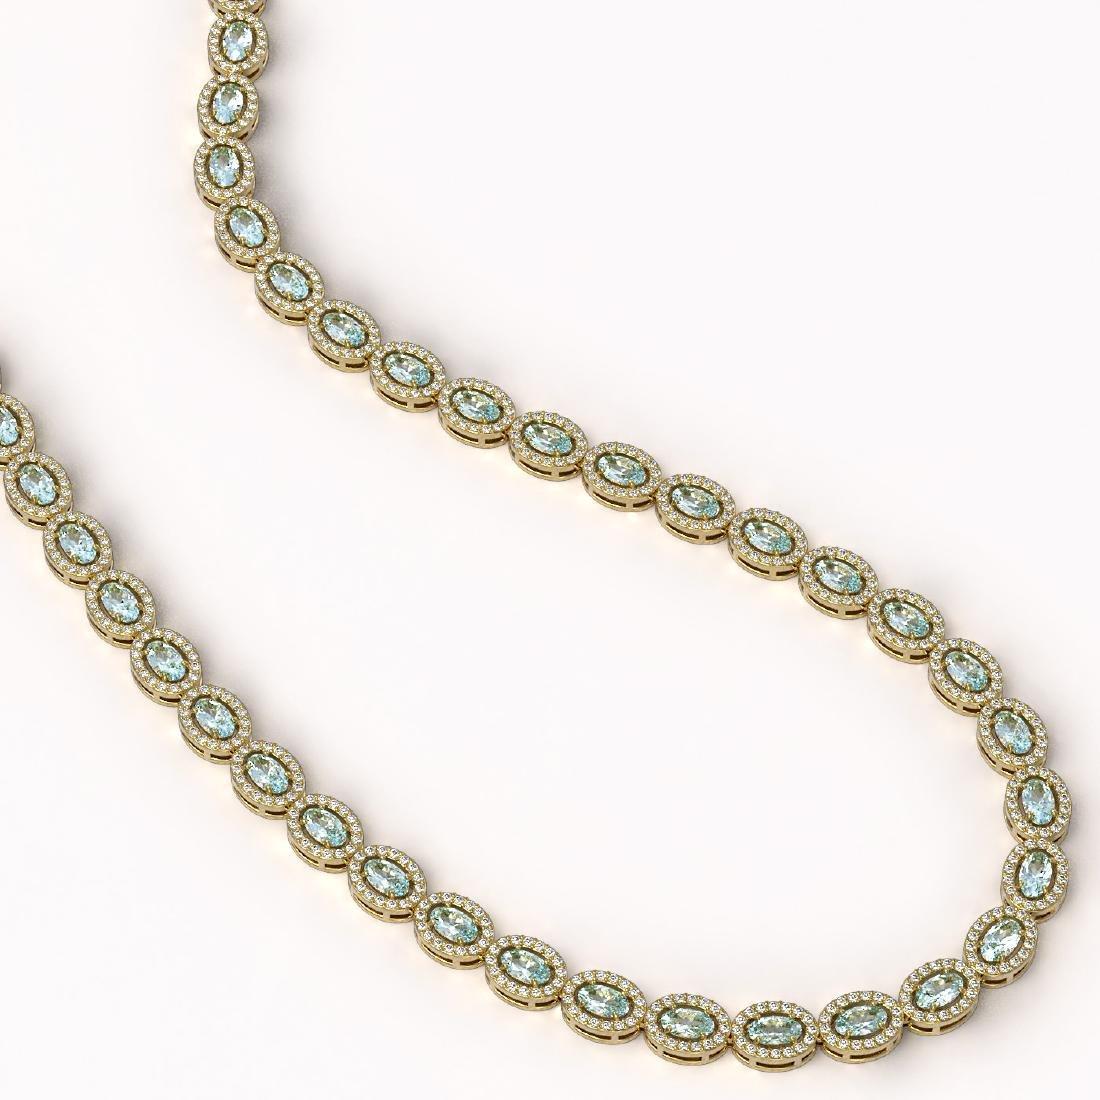 20.71 CTW Aquamarine & Diamond Halo Necklace 10K Yellow - 2